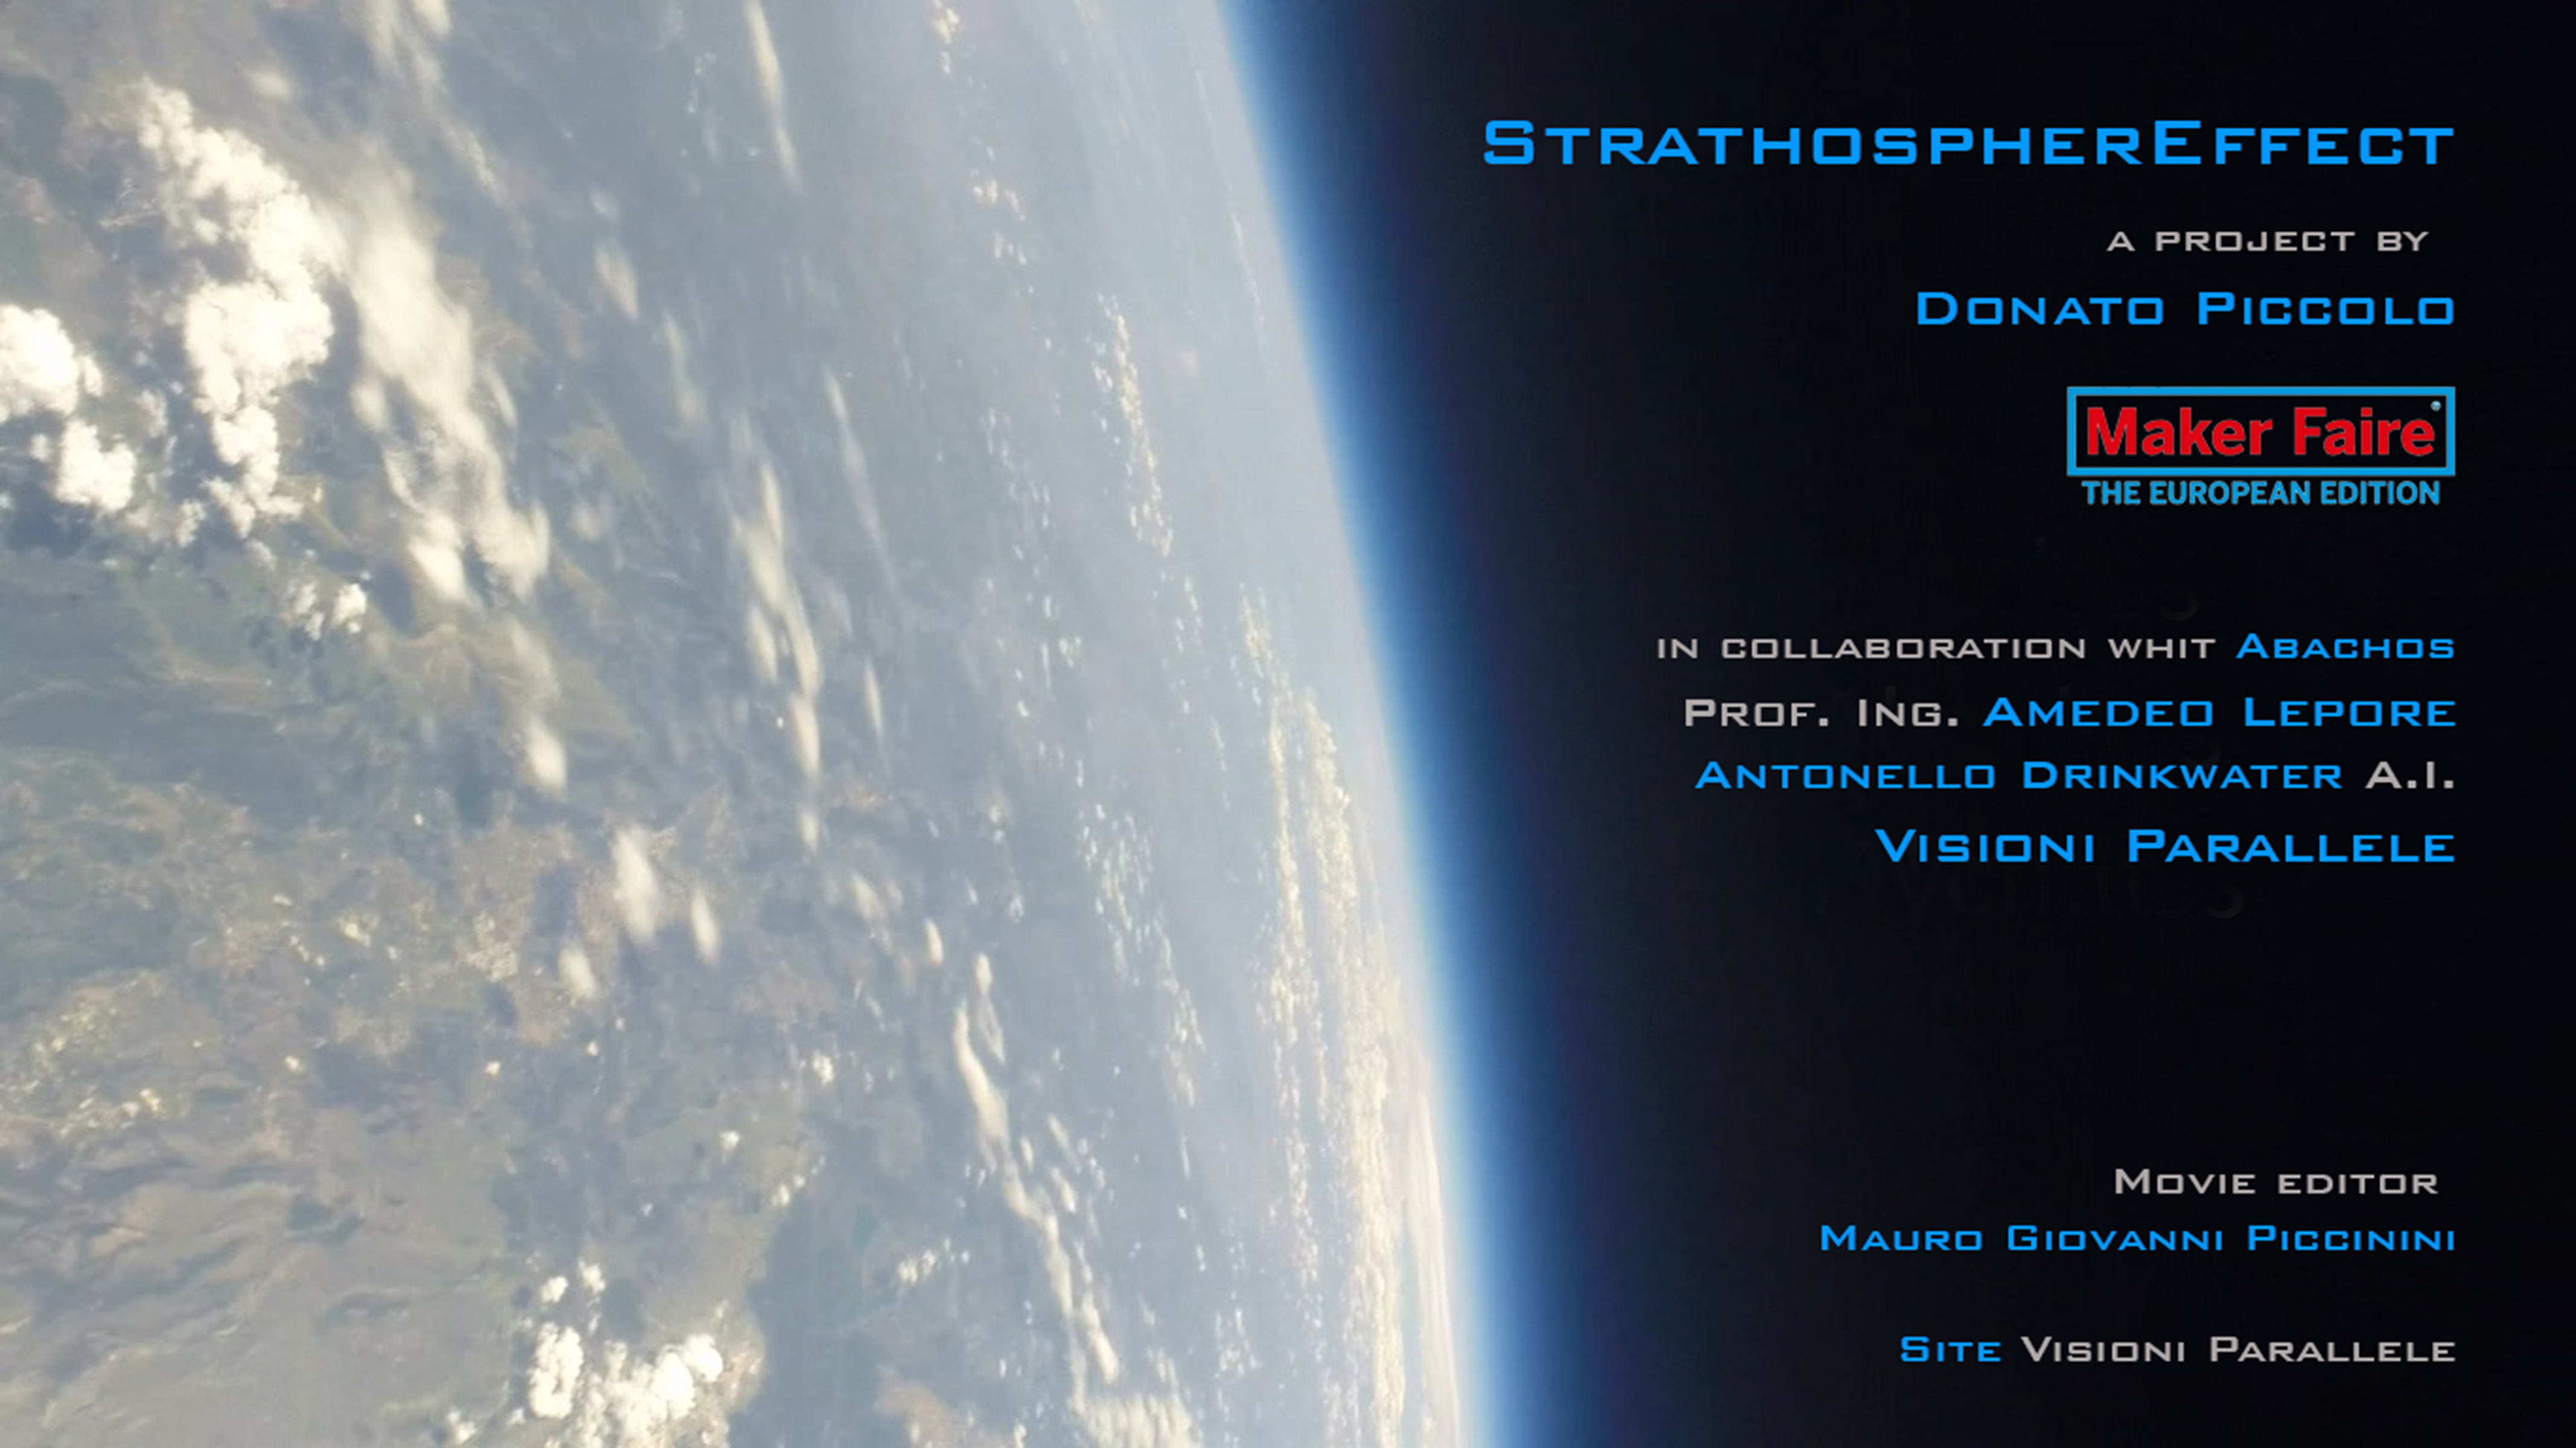 Strathosphereffect